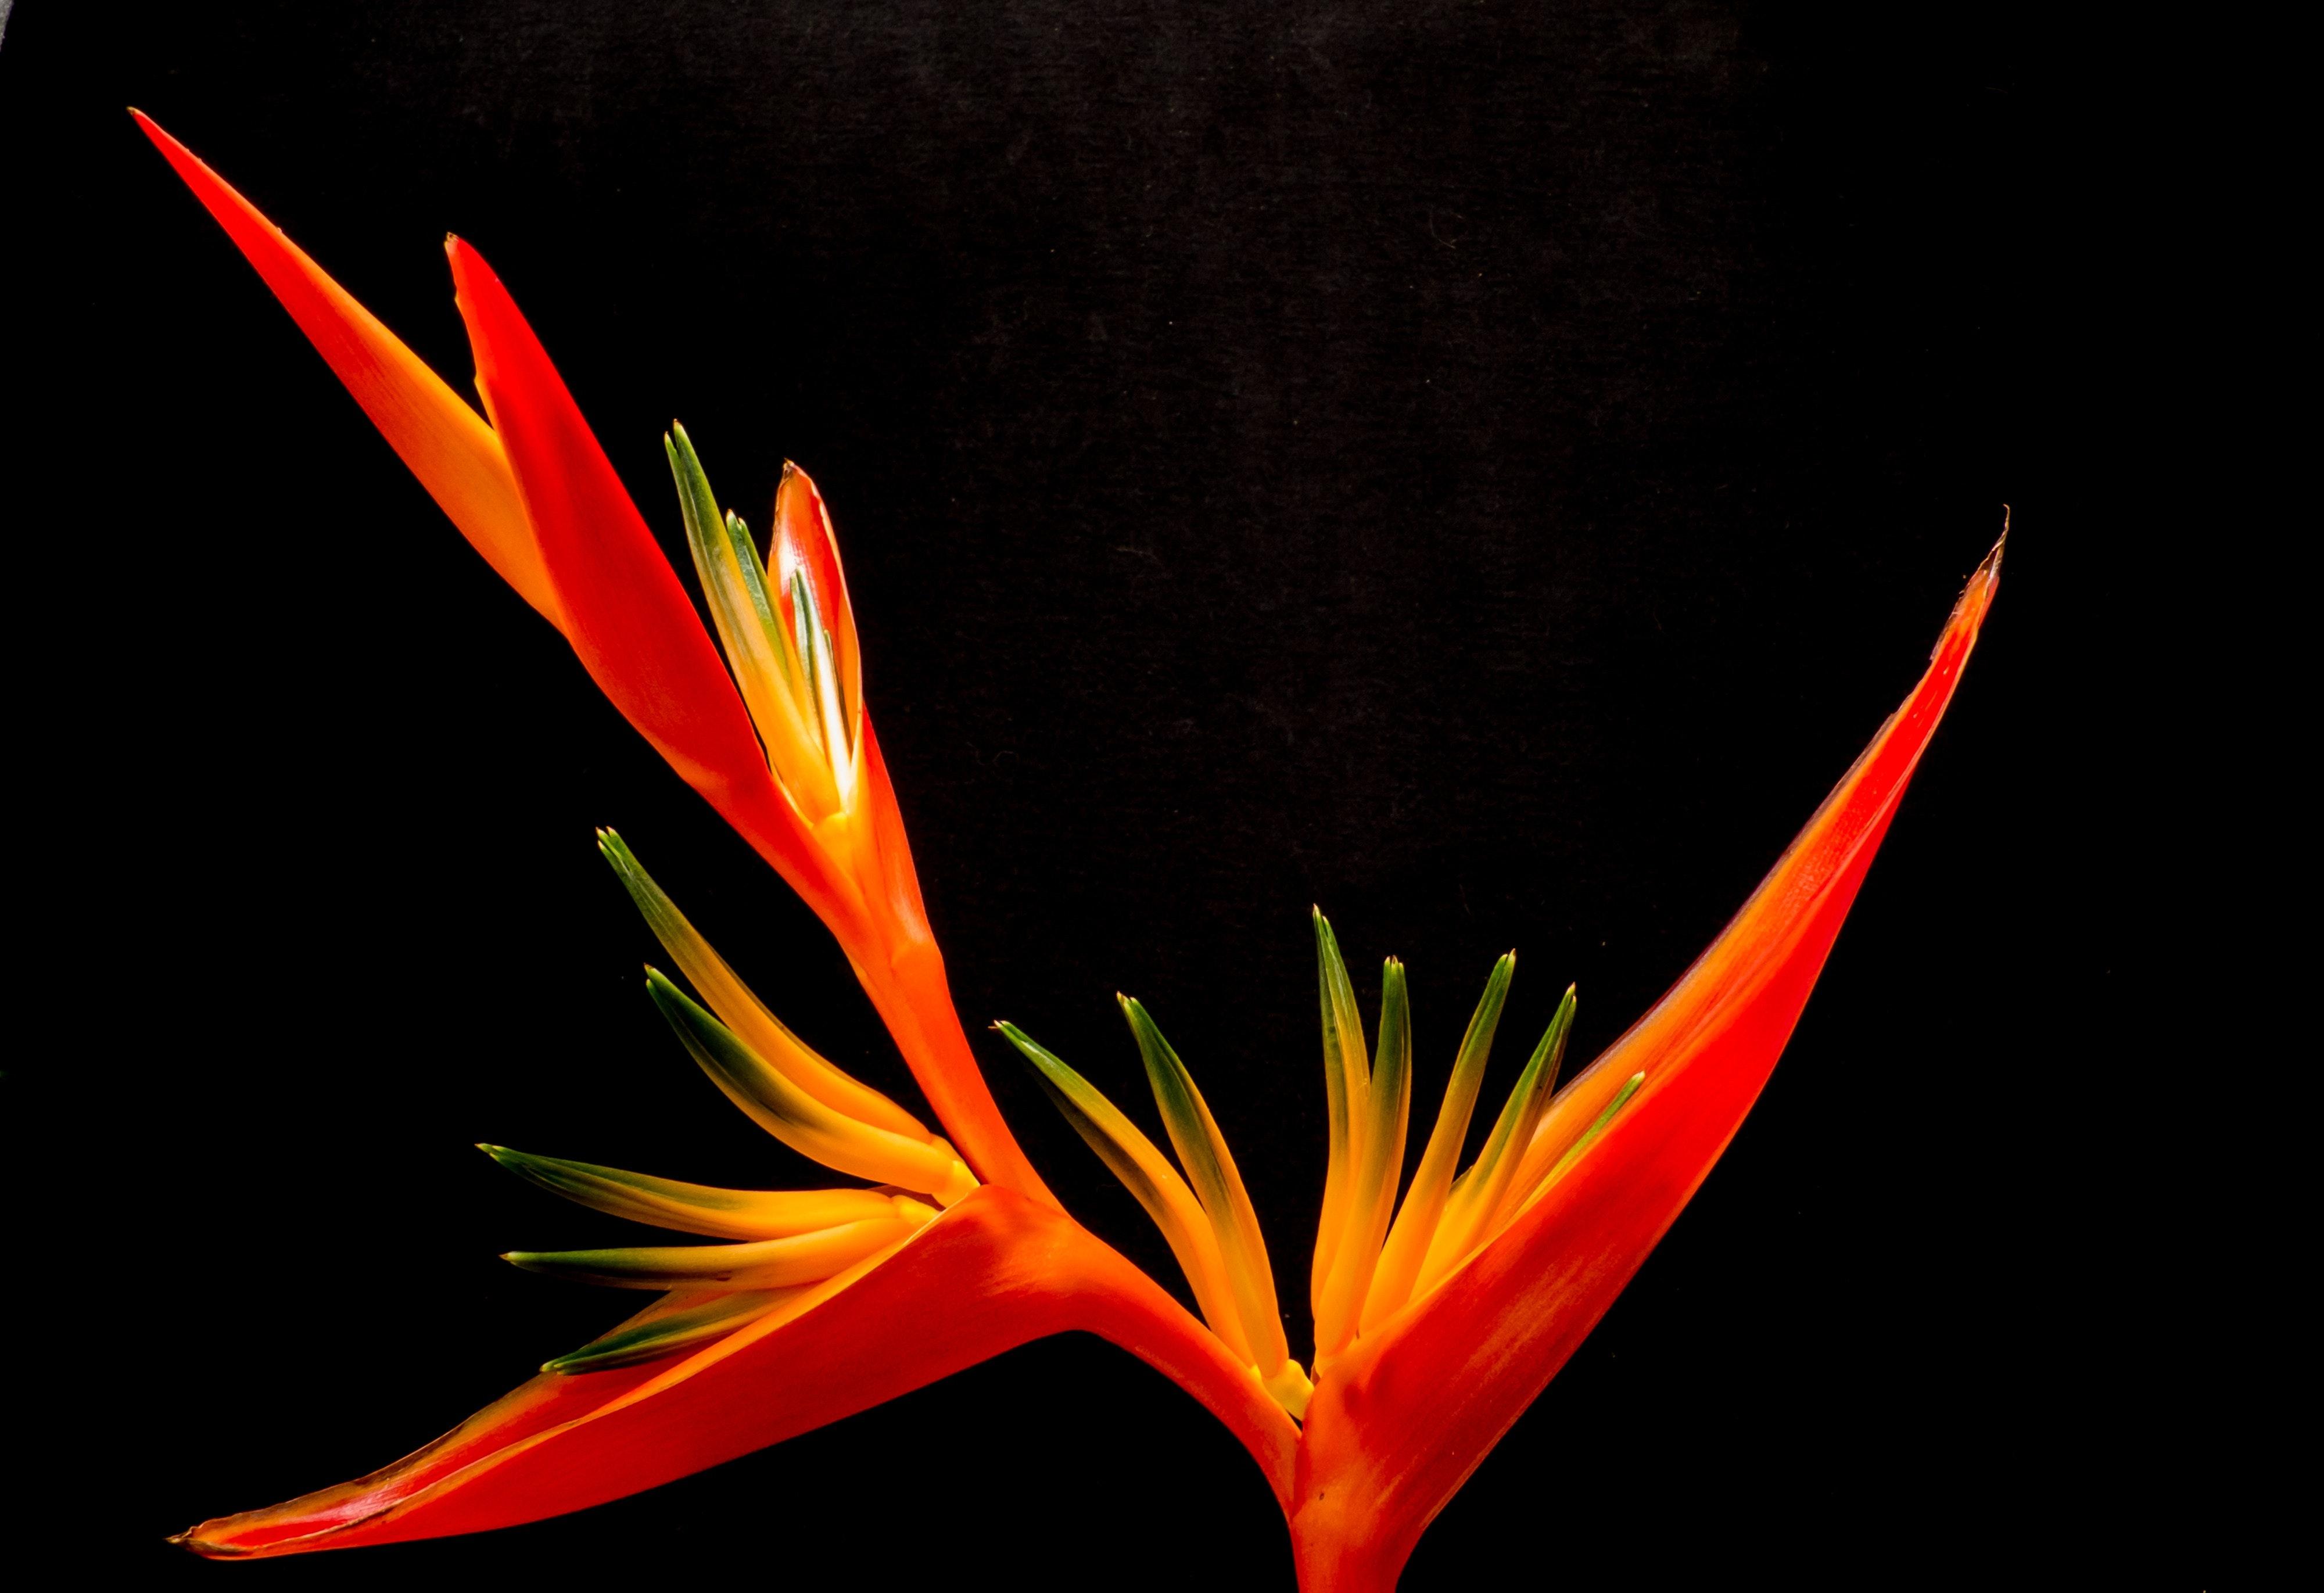 1000 Amazing Birds Of Paradise Flower Photos Pexels Free Stock